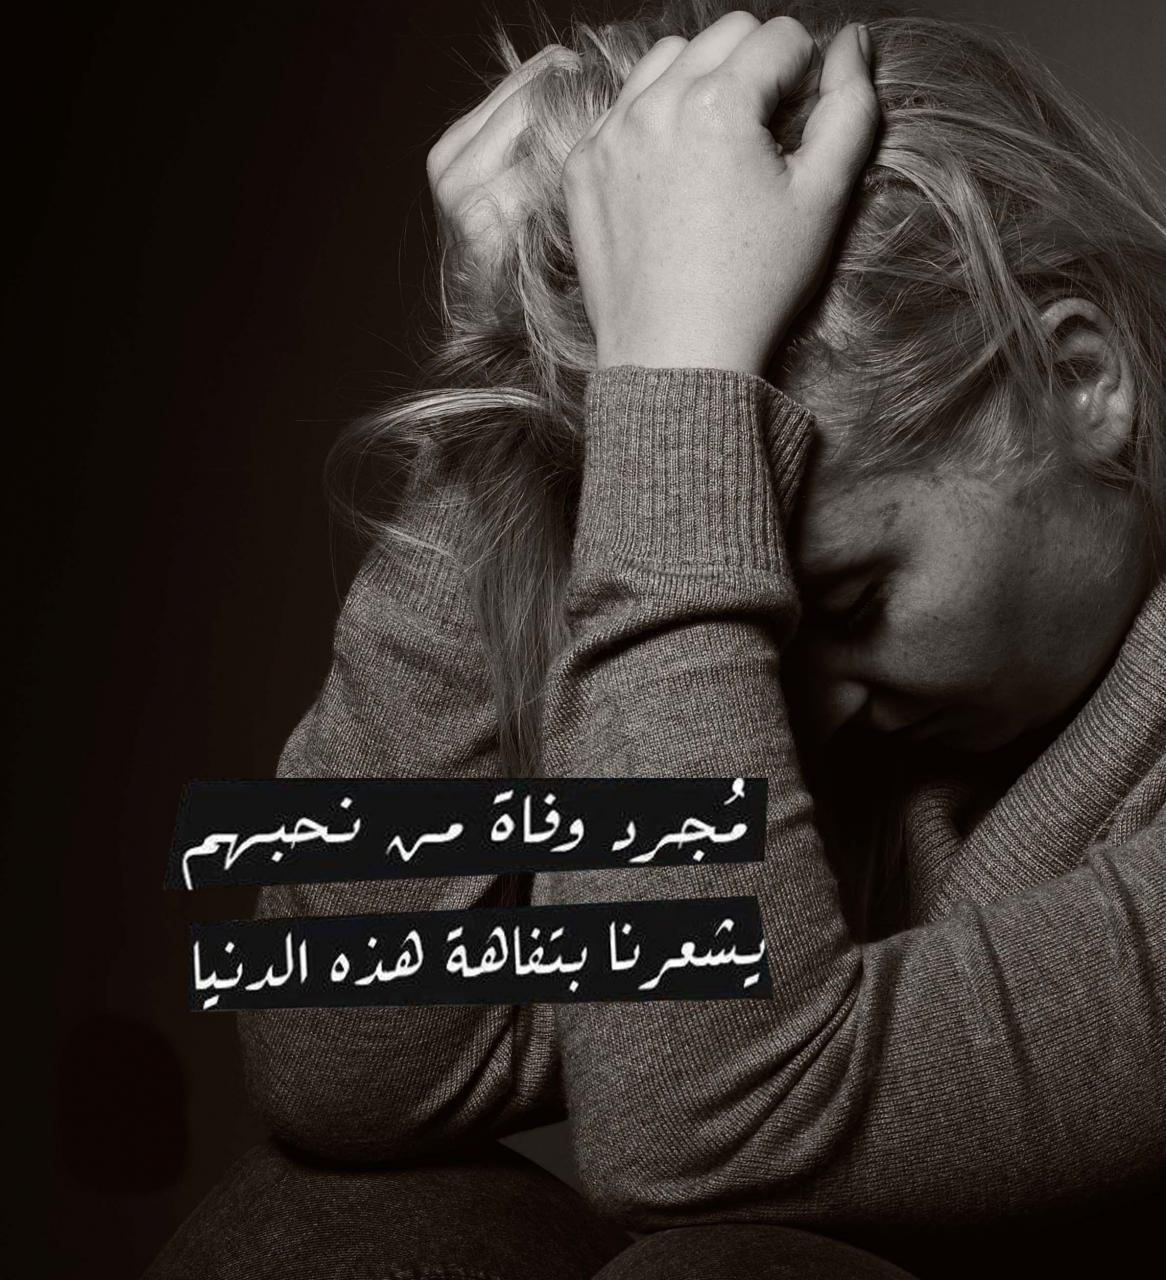 صور حزينه جدا 1